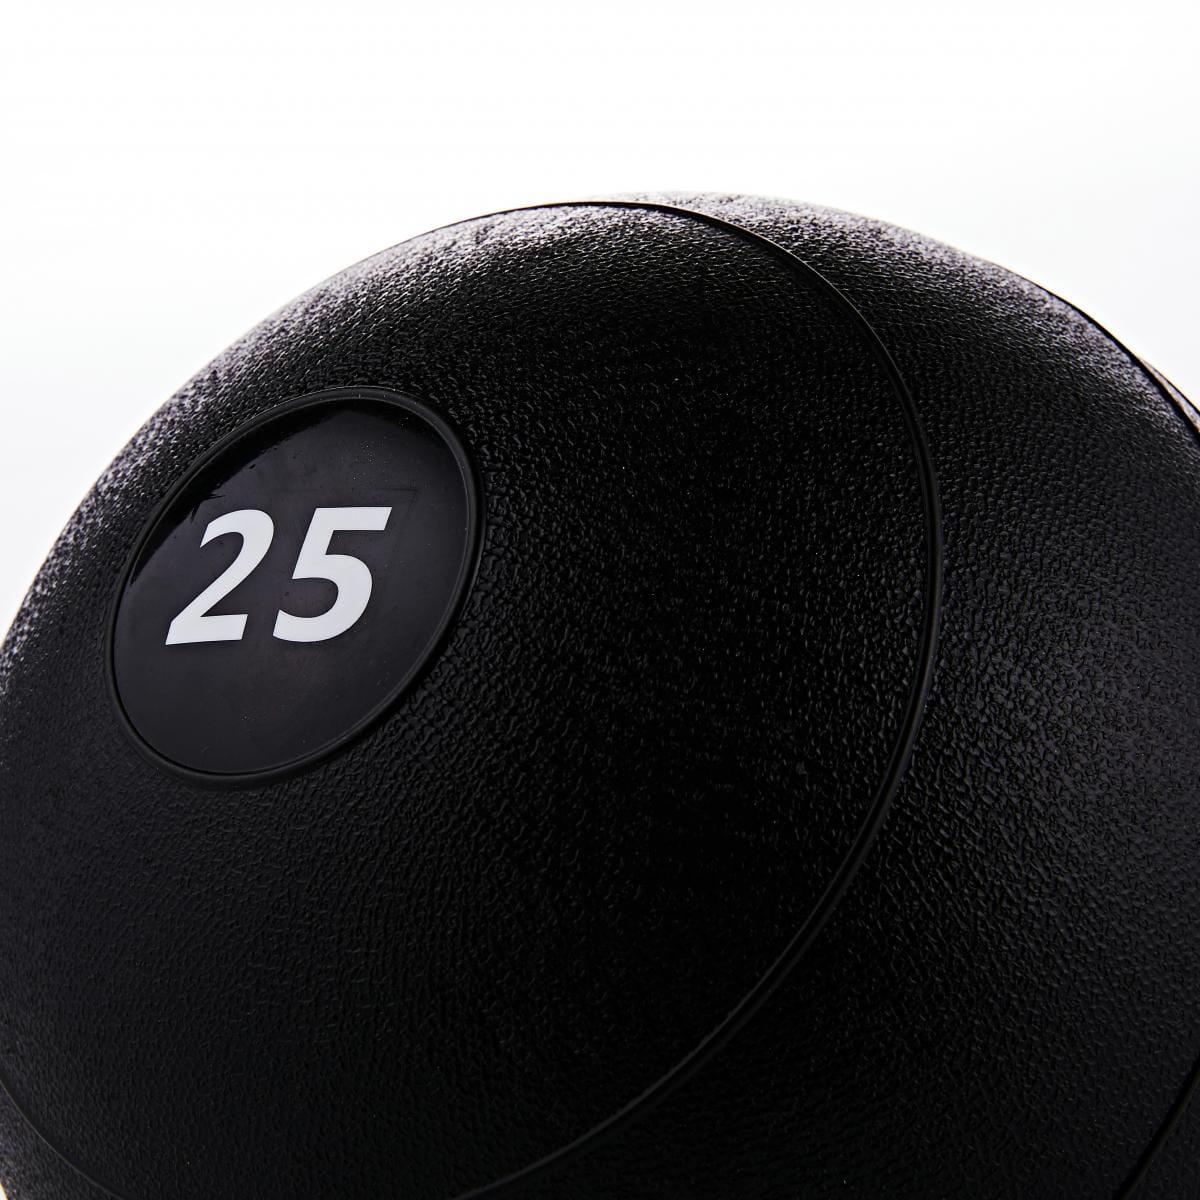 VITOS 重力球 25磅 11公斤 1